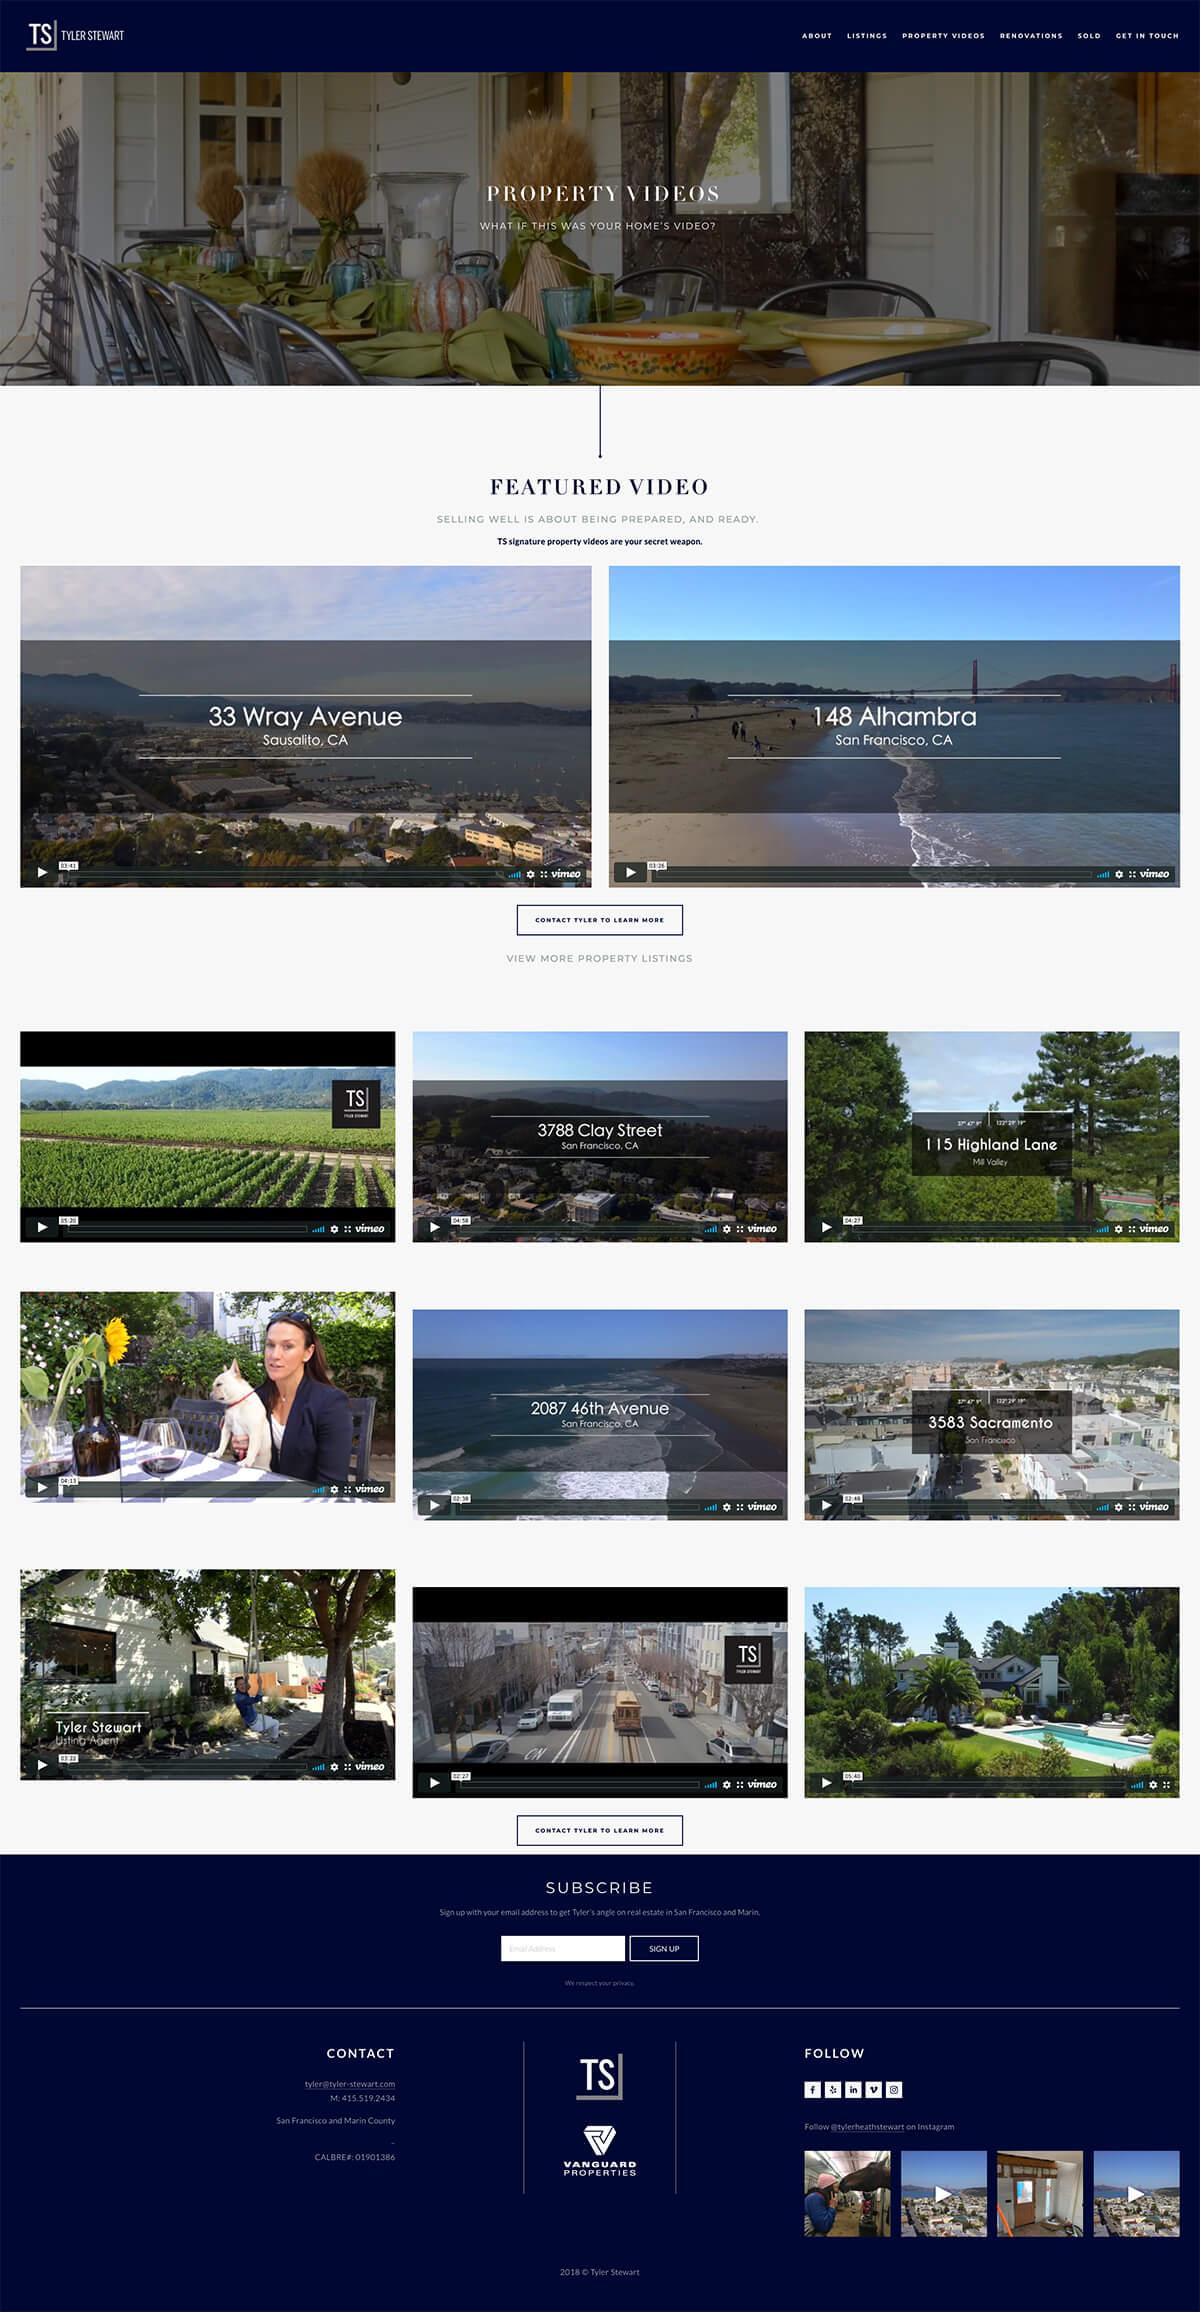 prperty-vids-tyler-page-website.jpg